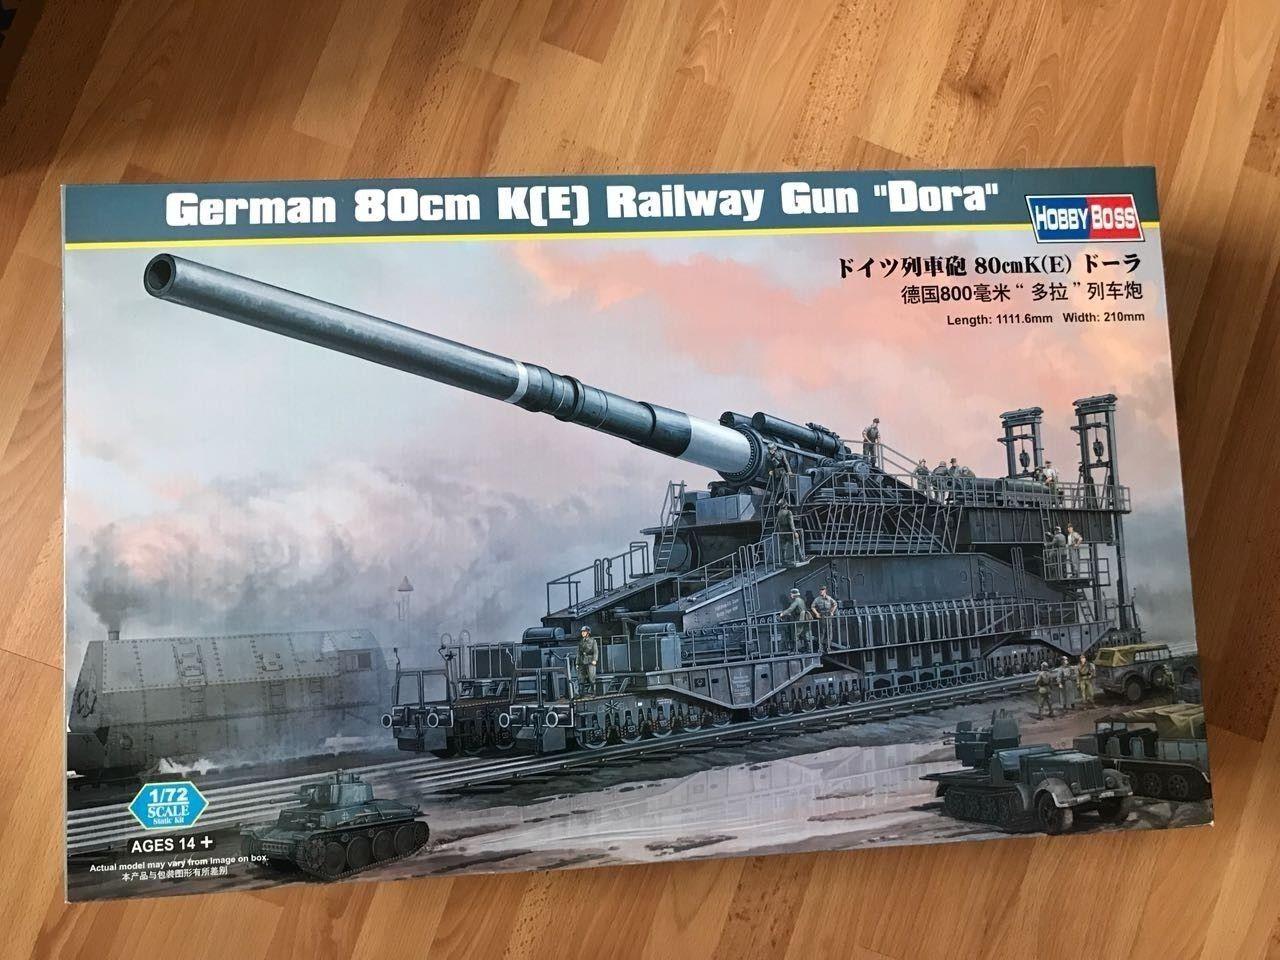 Modellbausatz Eisenbahngeschütz Dora Maßstab 1 72  | Einfach zu spielen, freies Leben